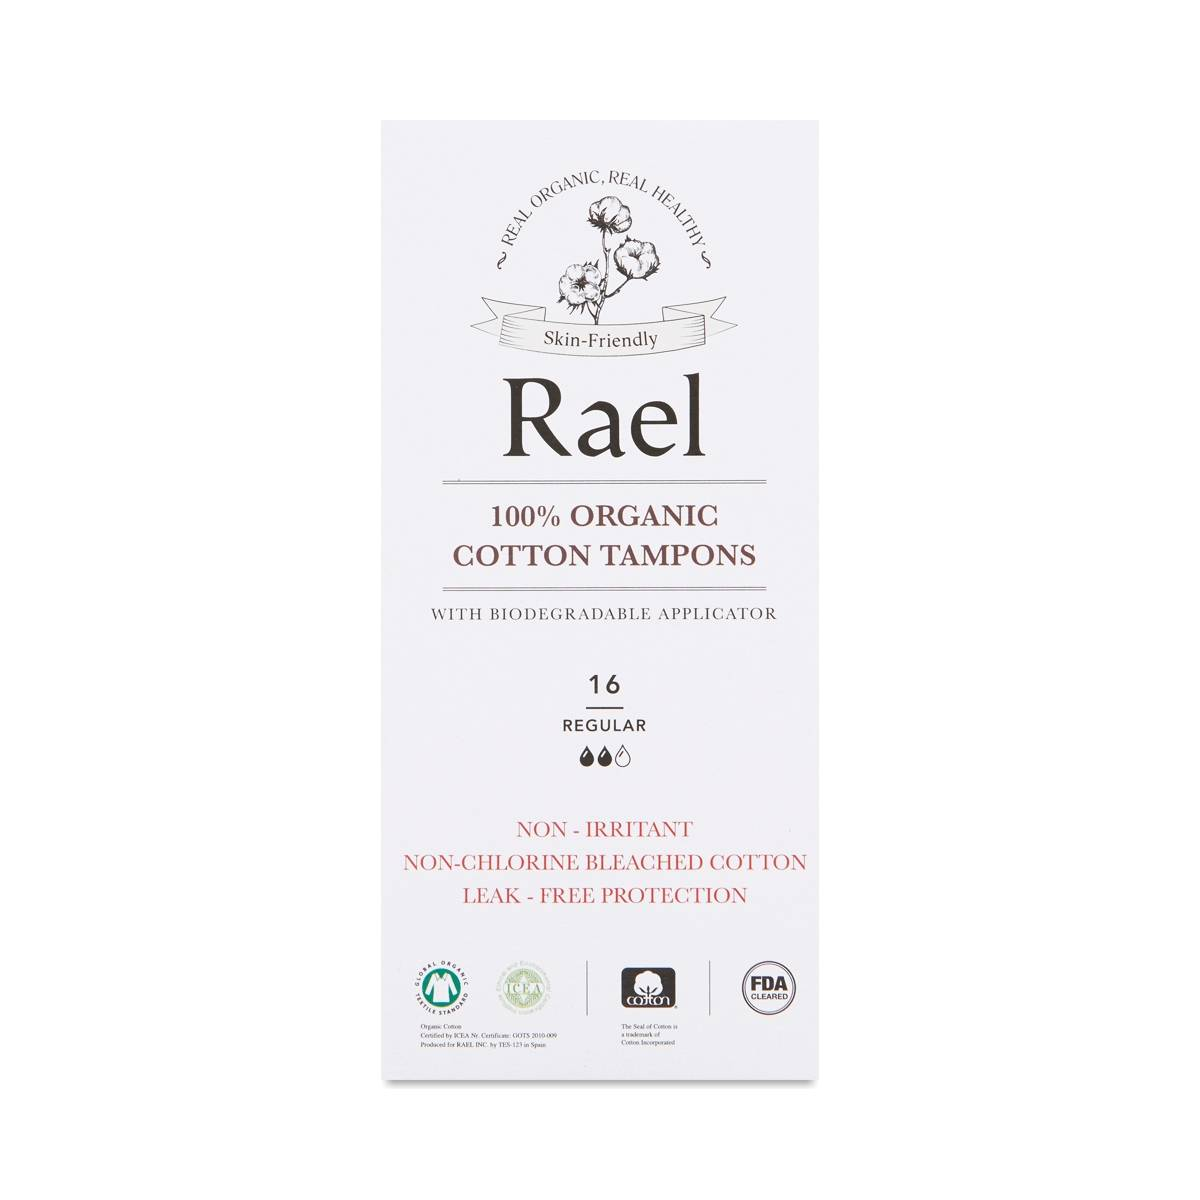 Rael Organic Regular Applicator Tampons - Thrive Market